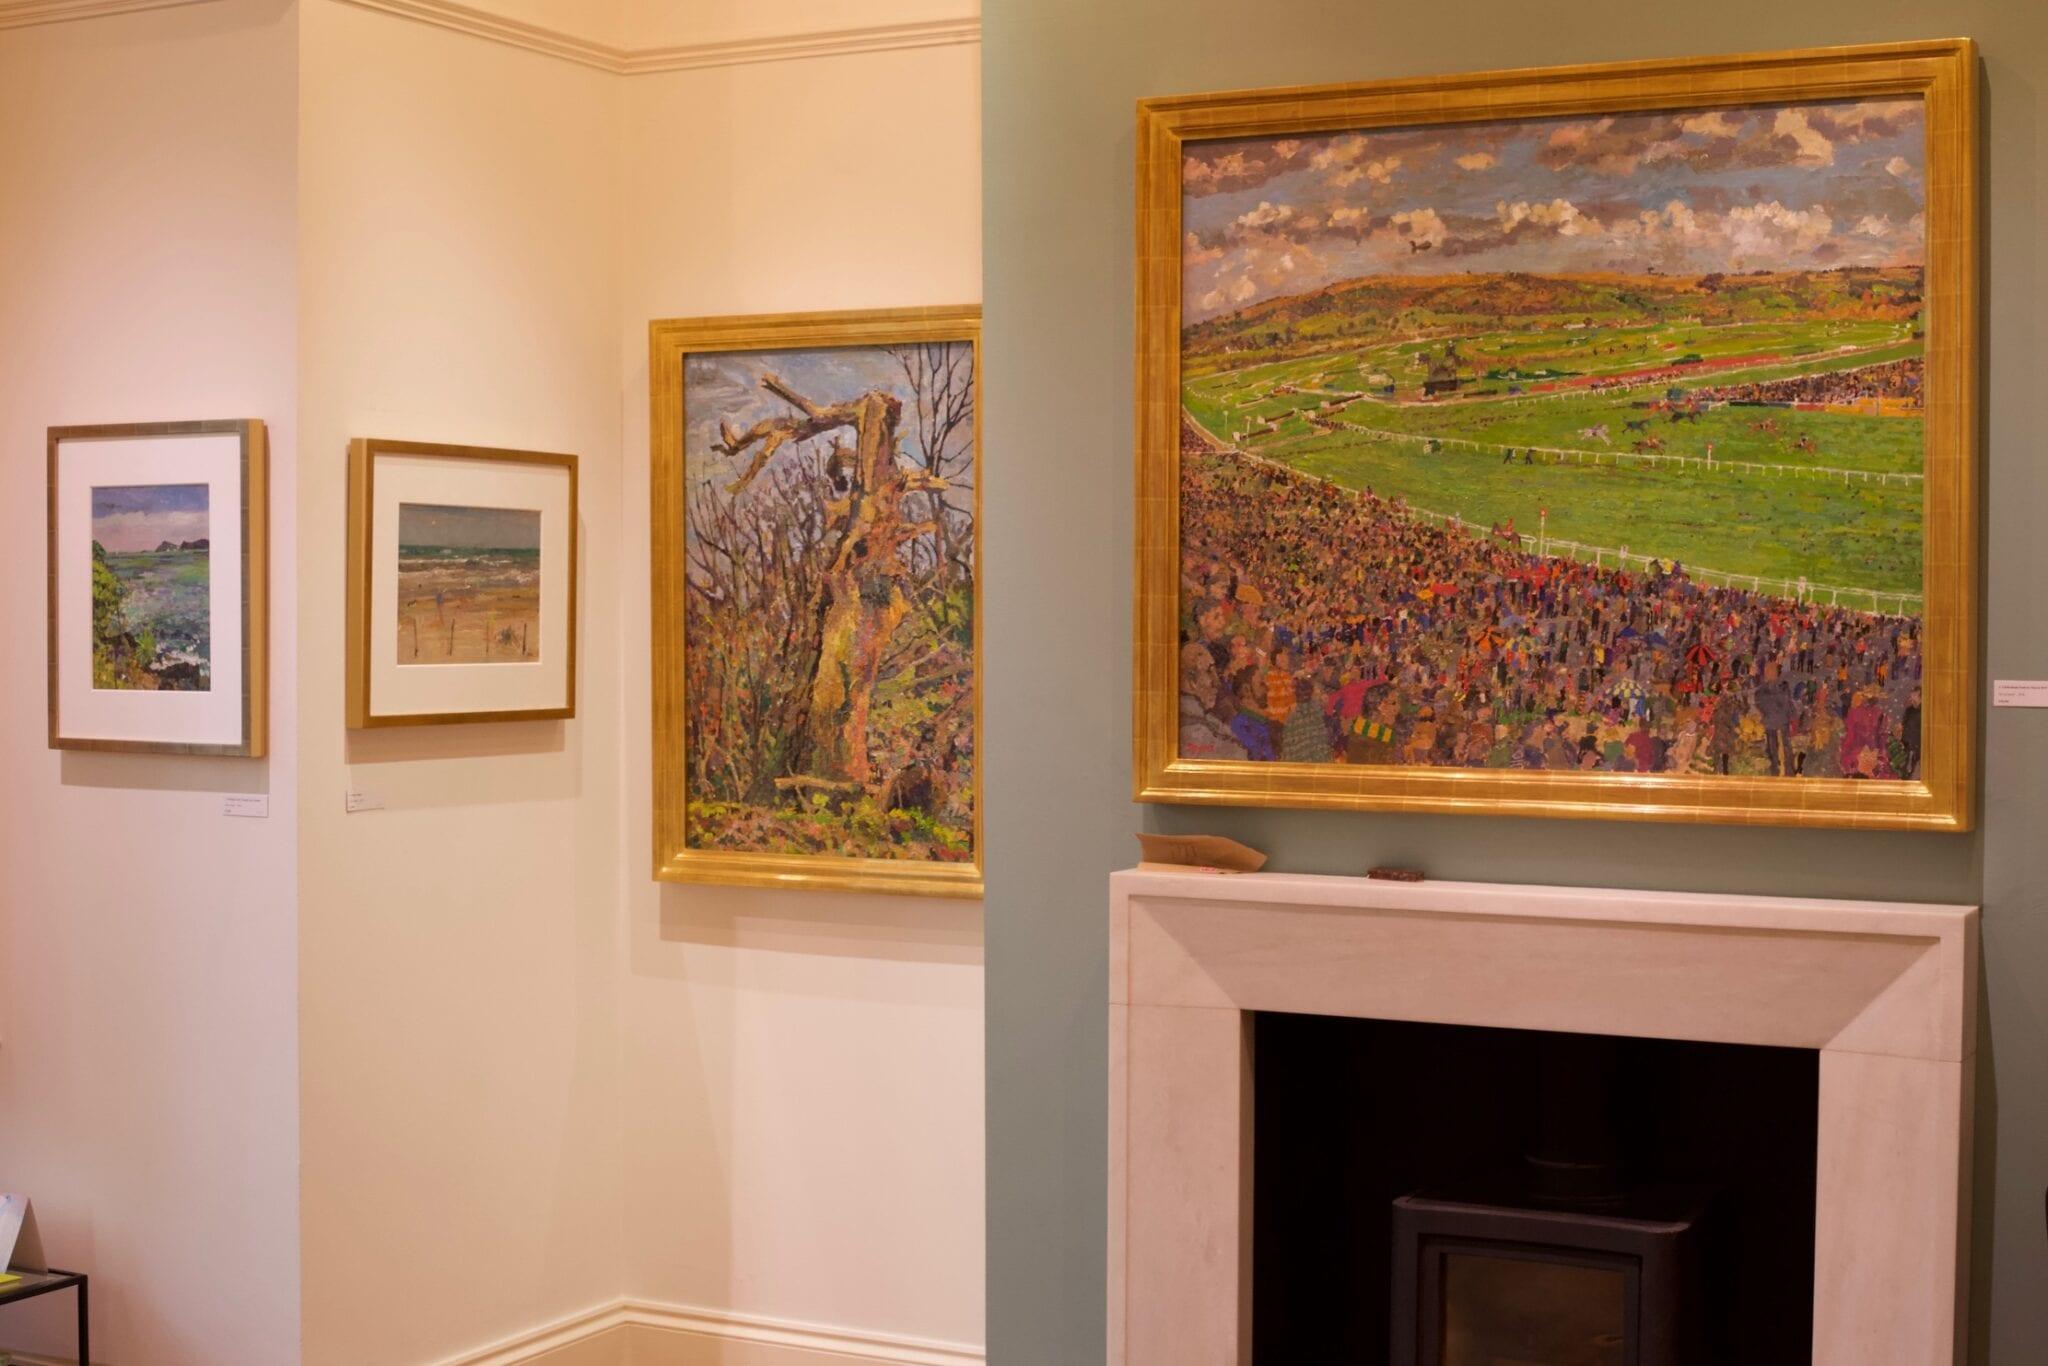 Images of 2020 Gallery Cranley Gallery Installation